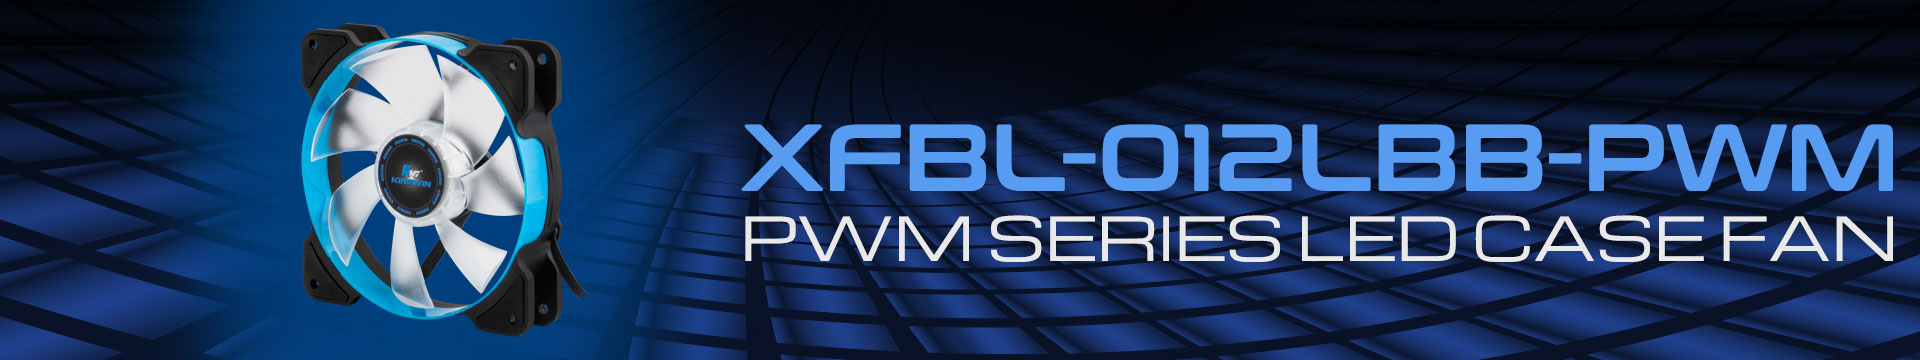 XFBL-012LBB-PWM_WEB_BANNER2